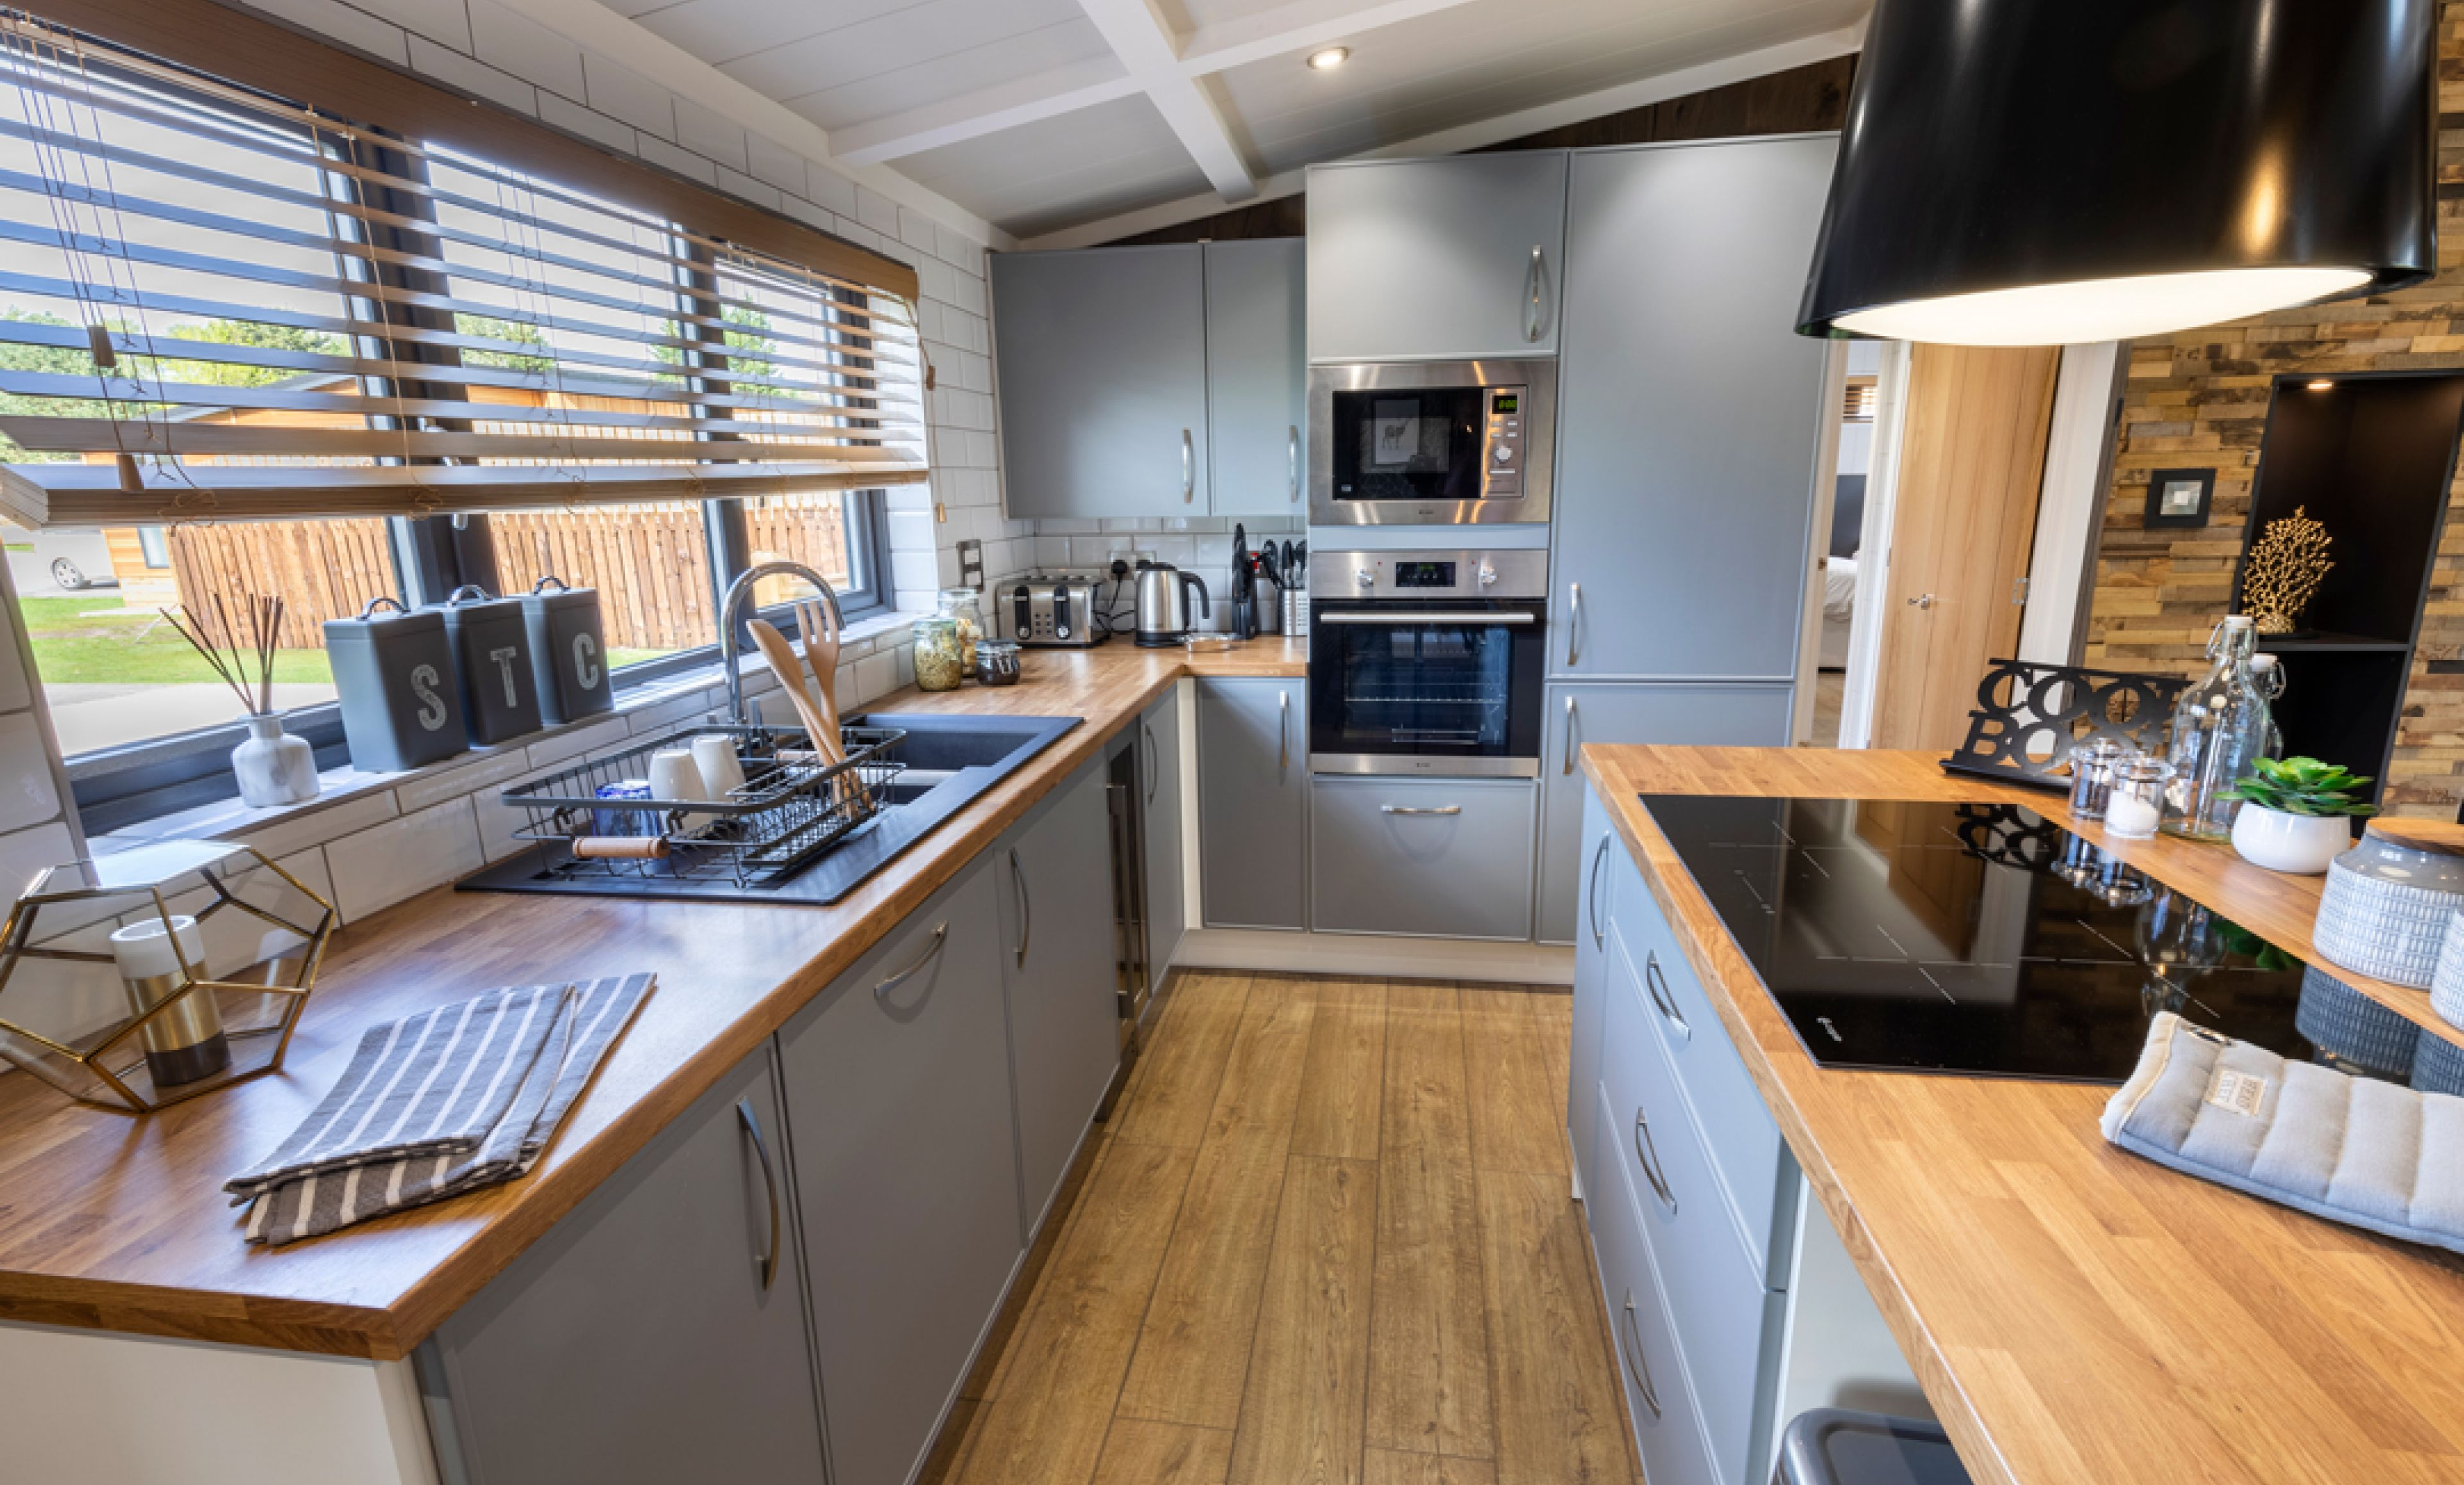 The Sherwood Kitchen